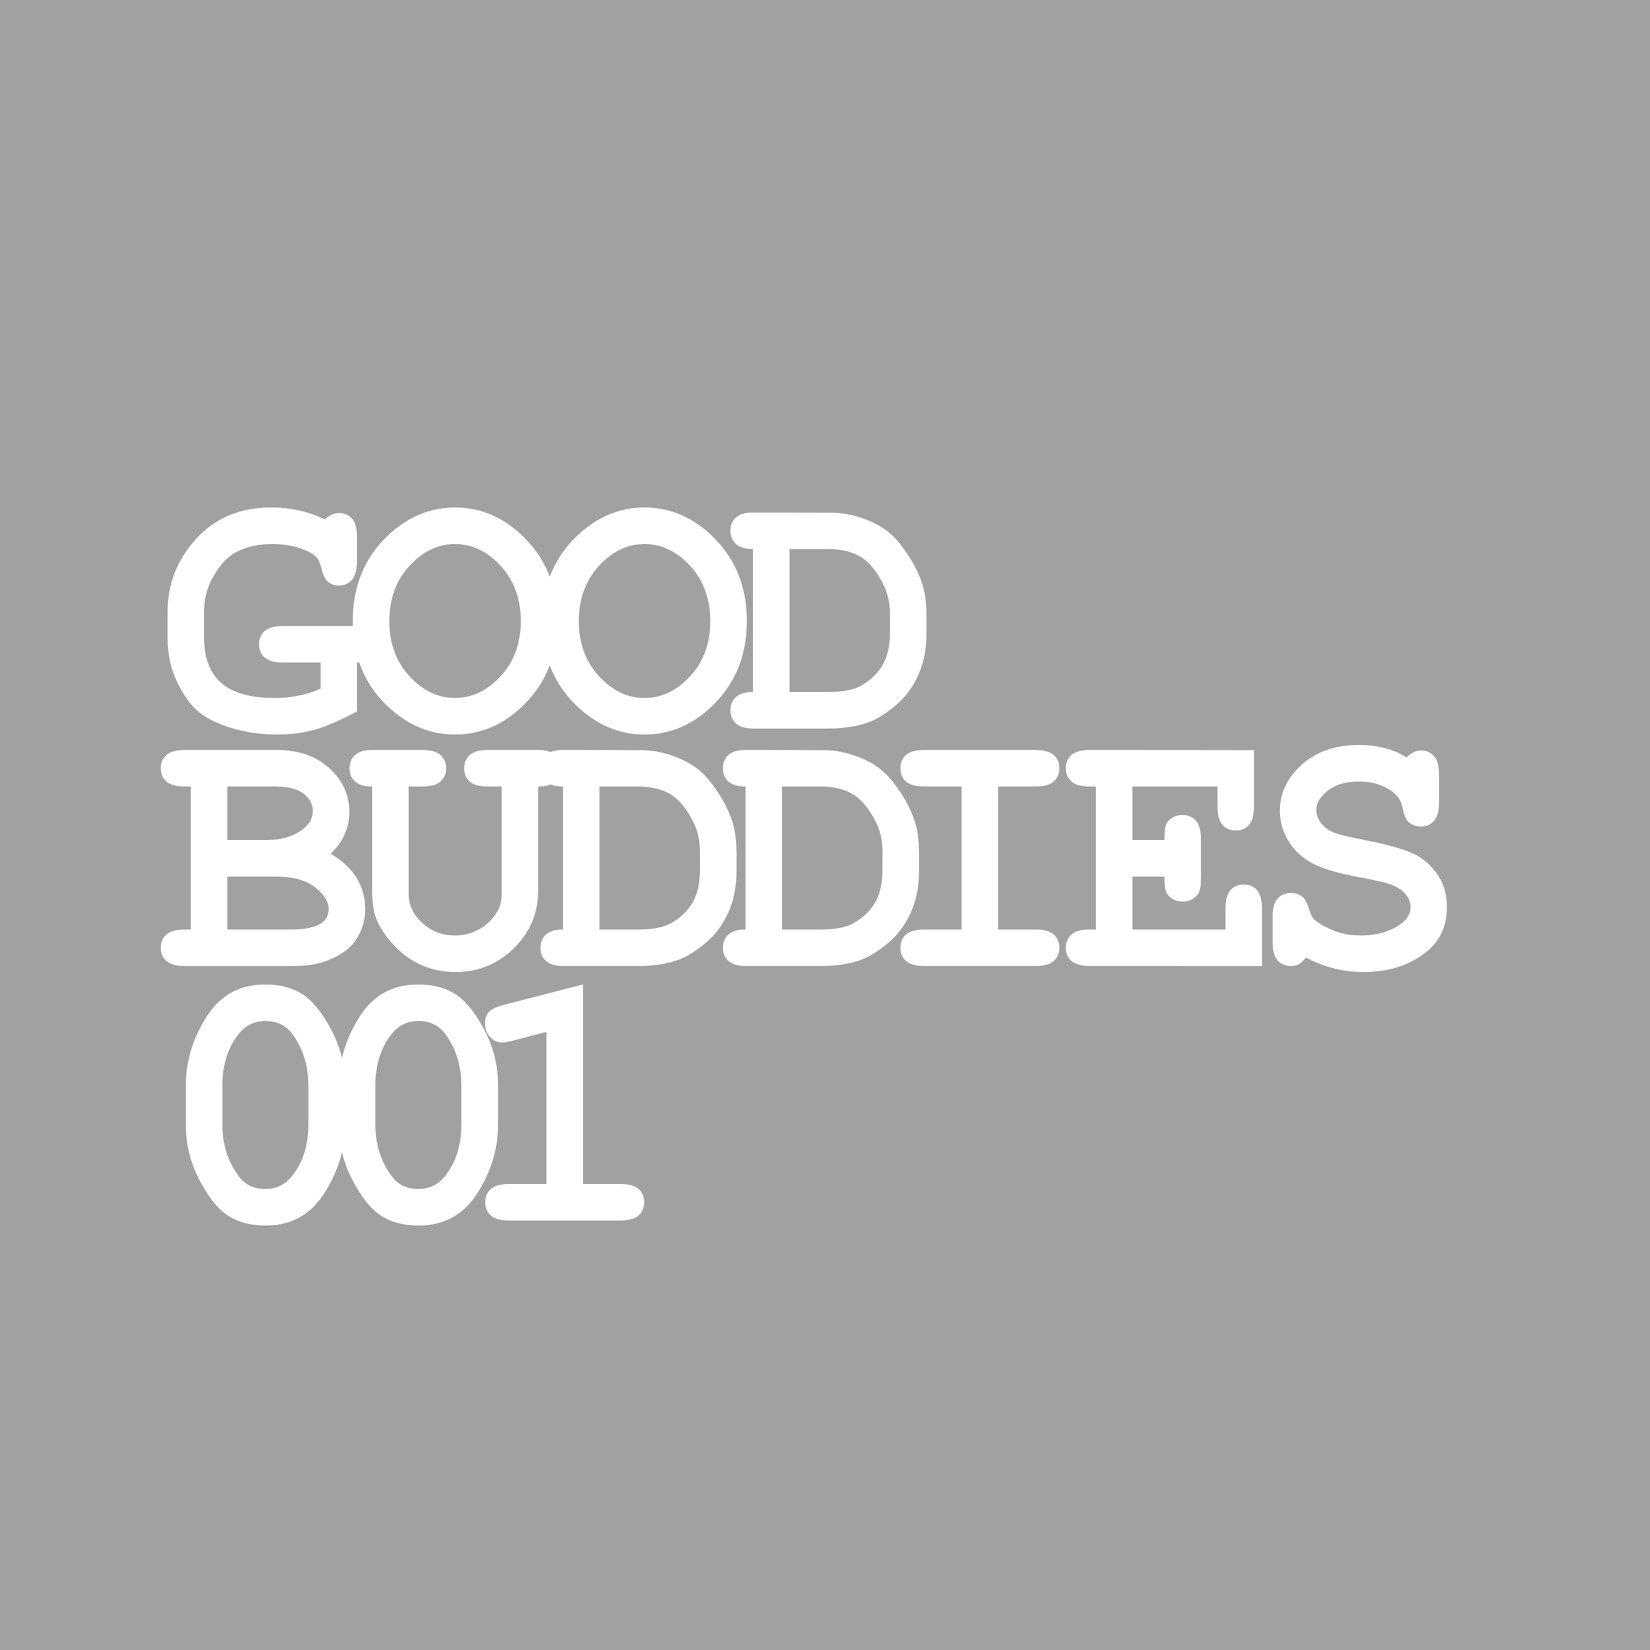 Good Buddies 001 Artwork